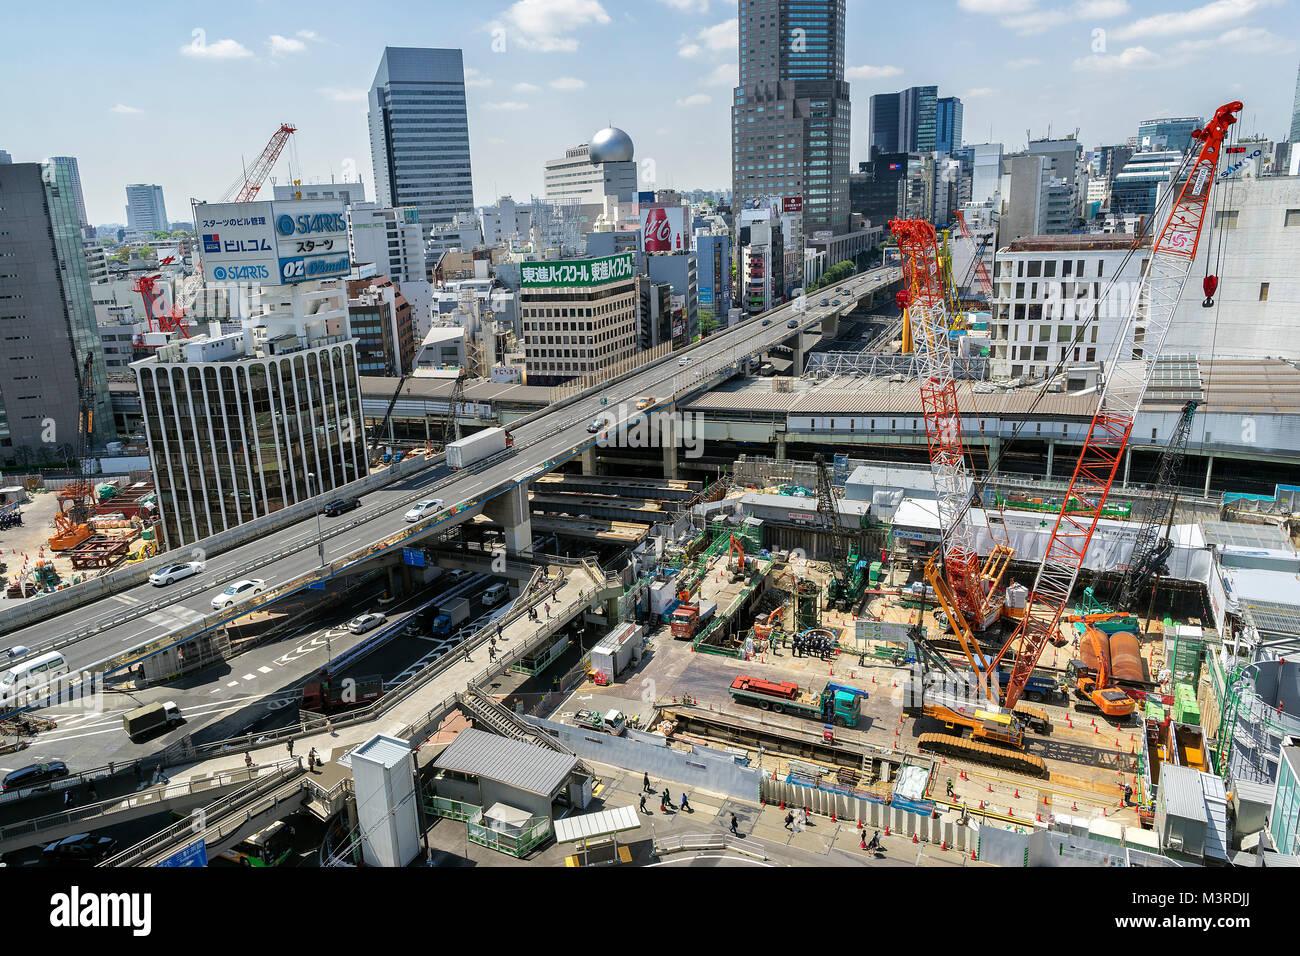 Japan, Honshu island, Kanto, Tokyo, Shibuya, construction site. - Stock Image